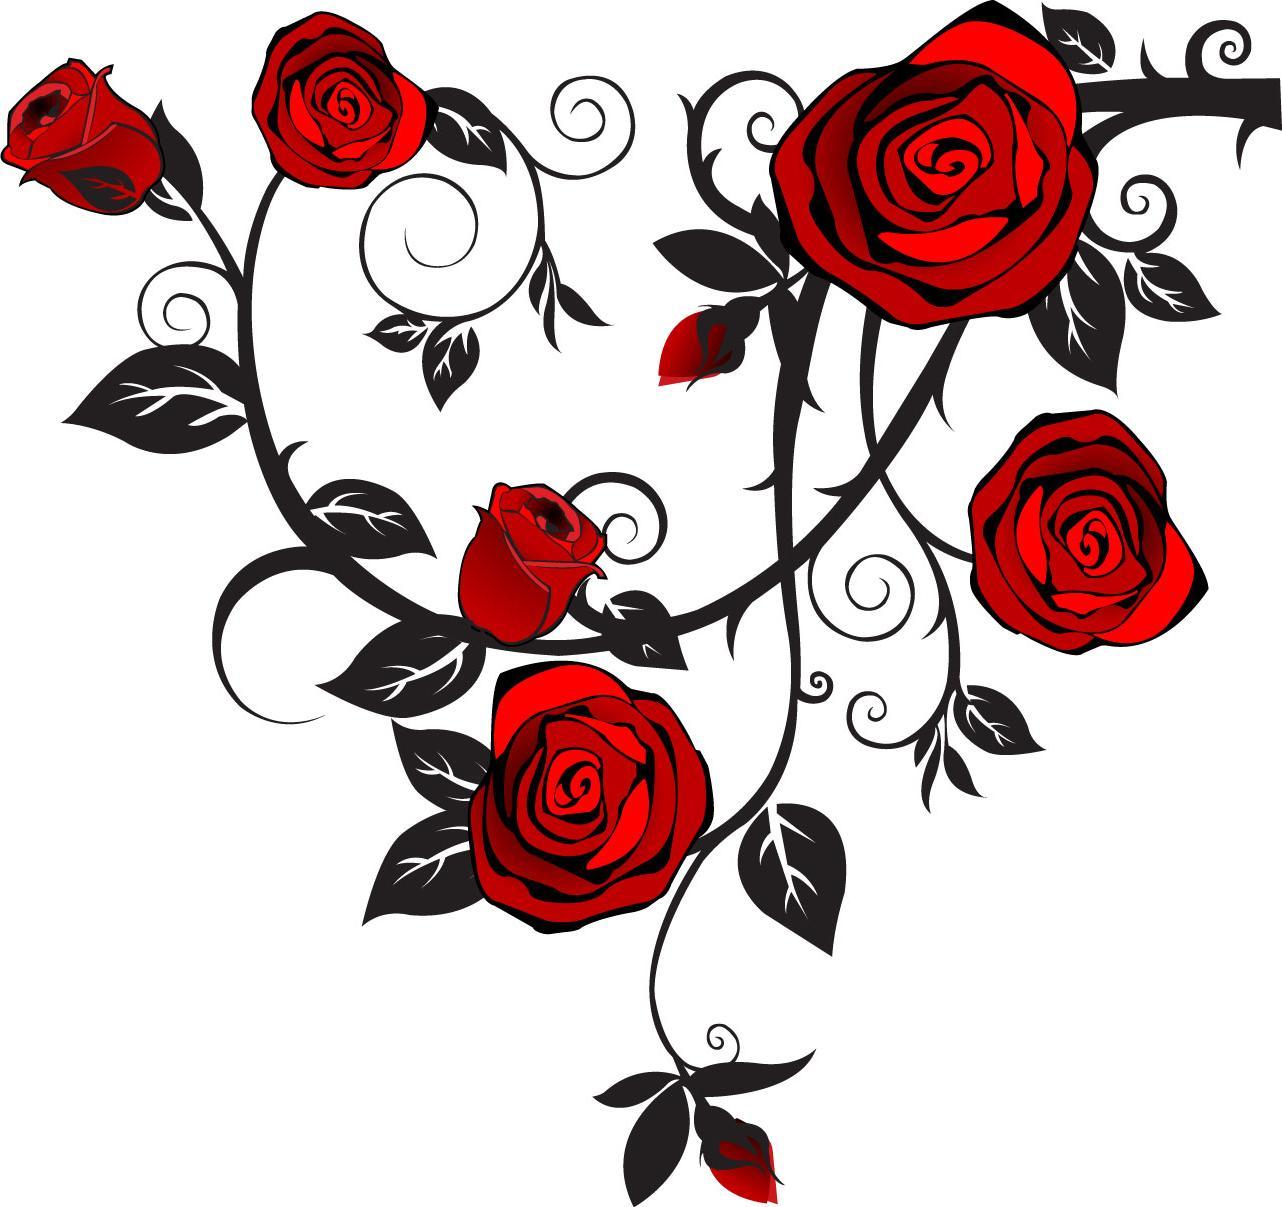 1282x1207 Best Rose Vine Art Vector Cdr Free Vector Art, Images, Graphics